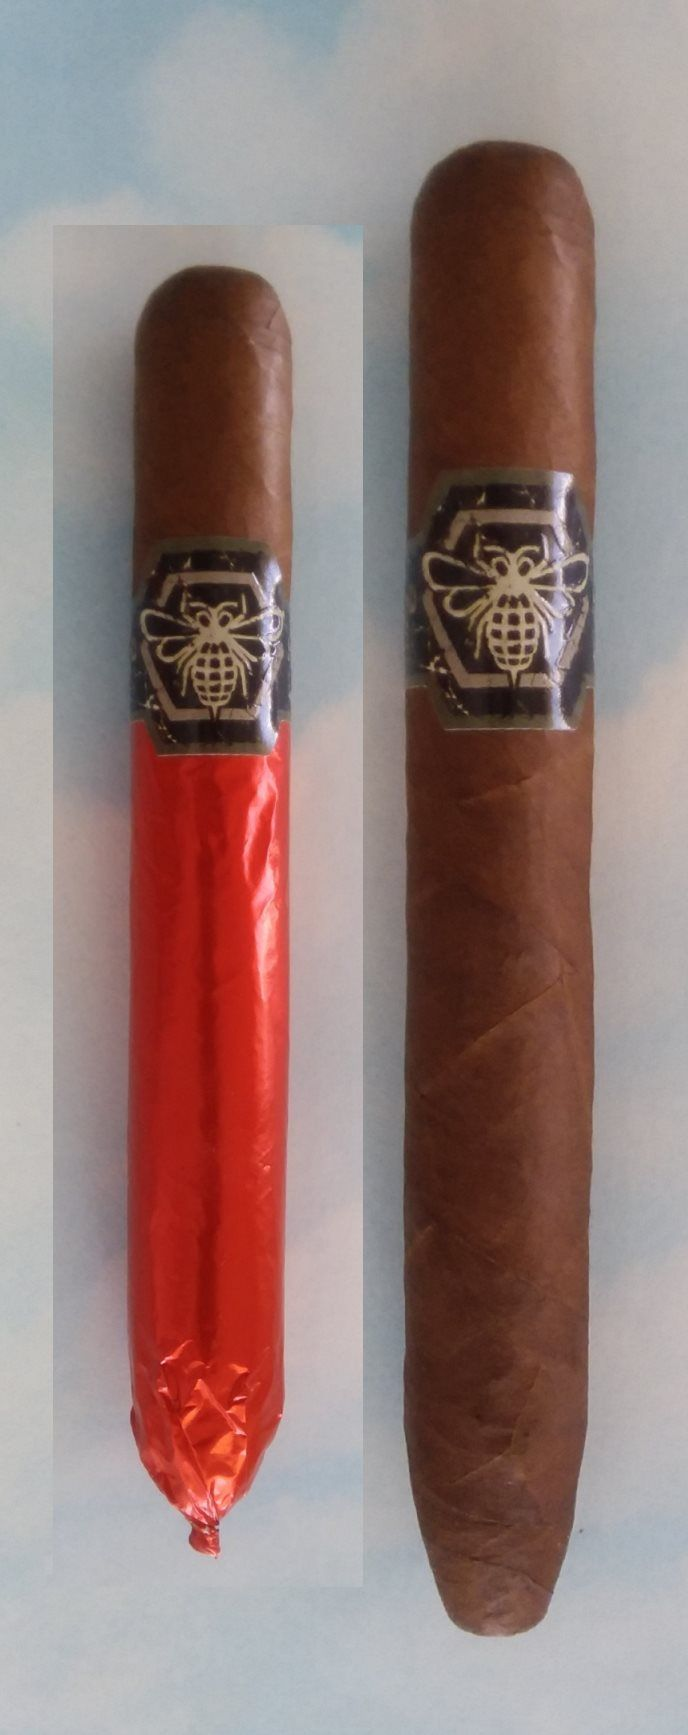 Honey and Hand Grenades Cigar